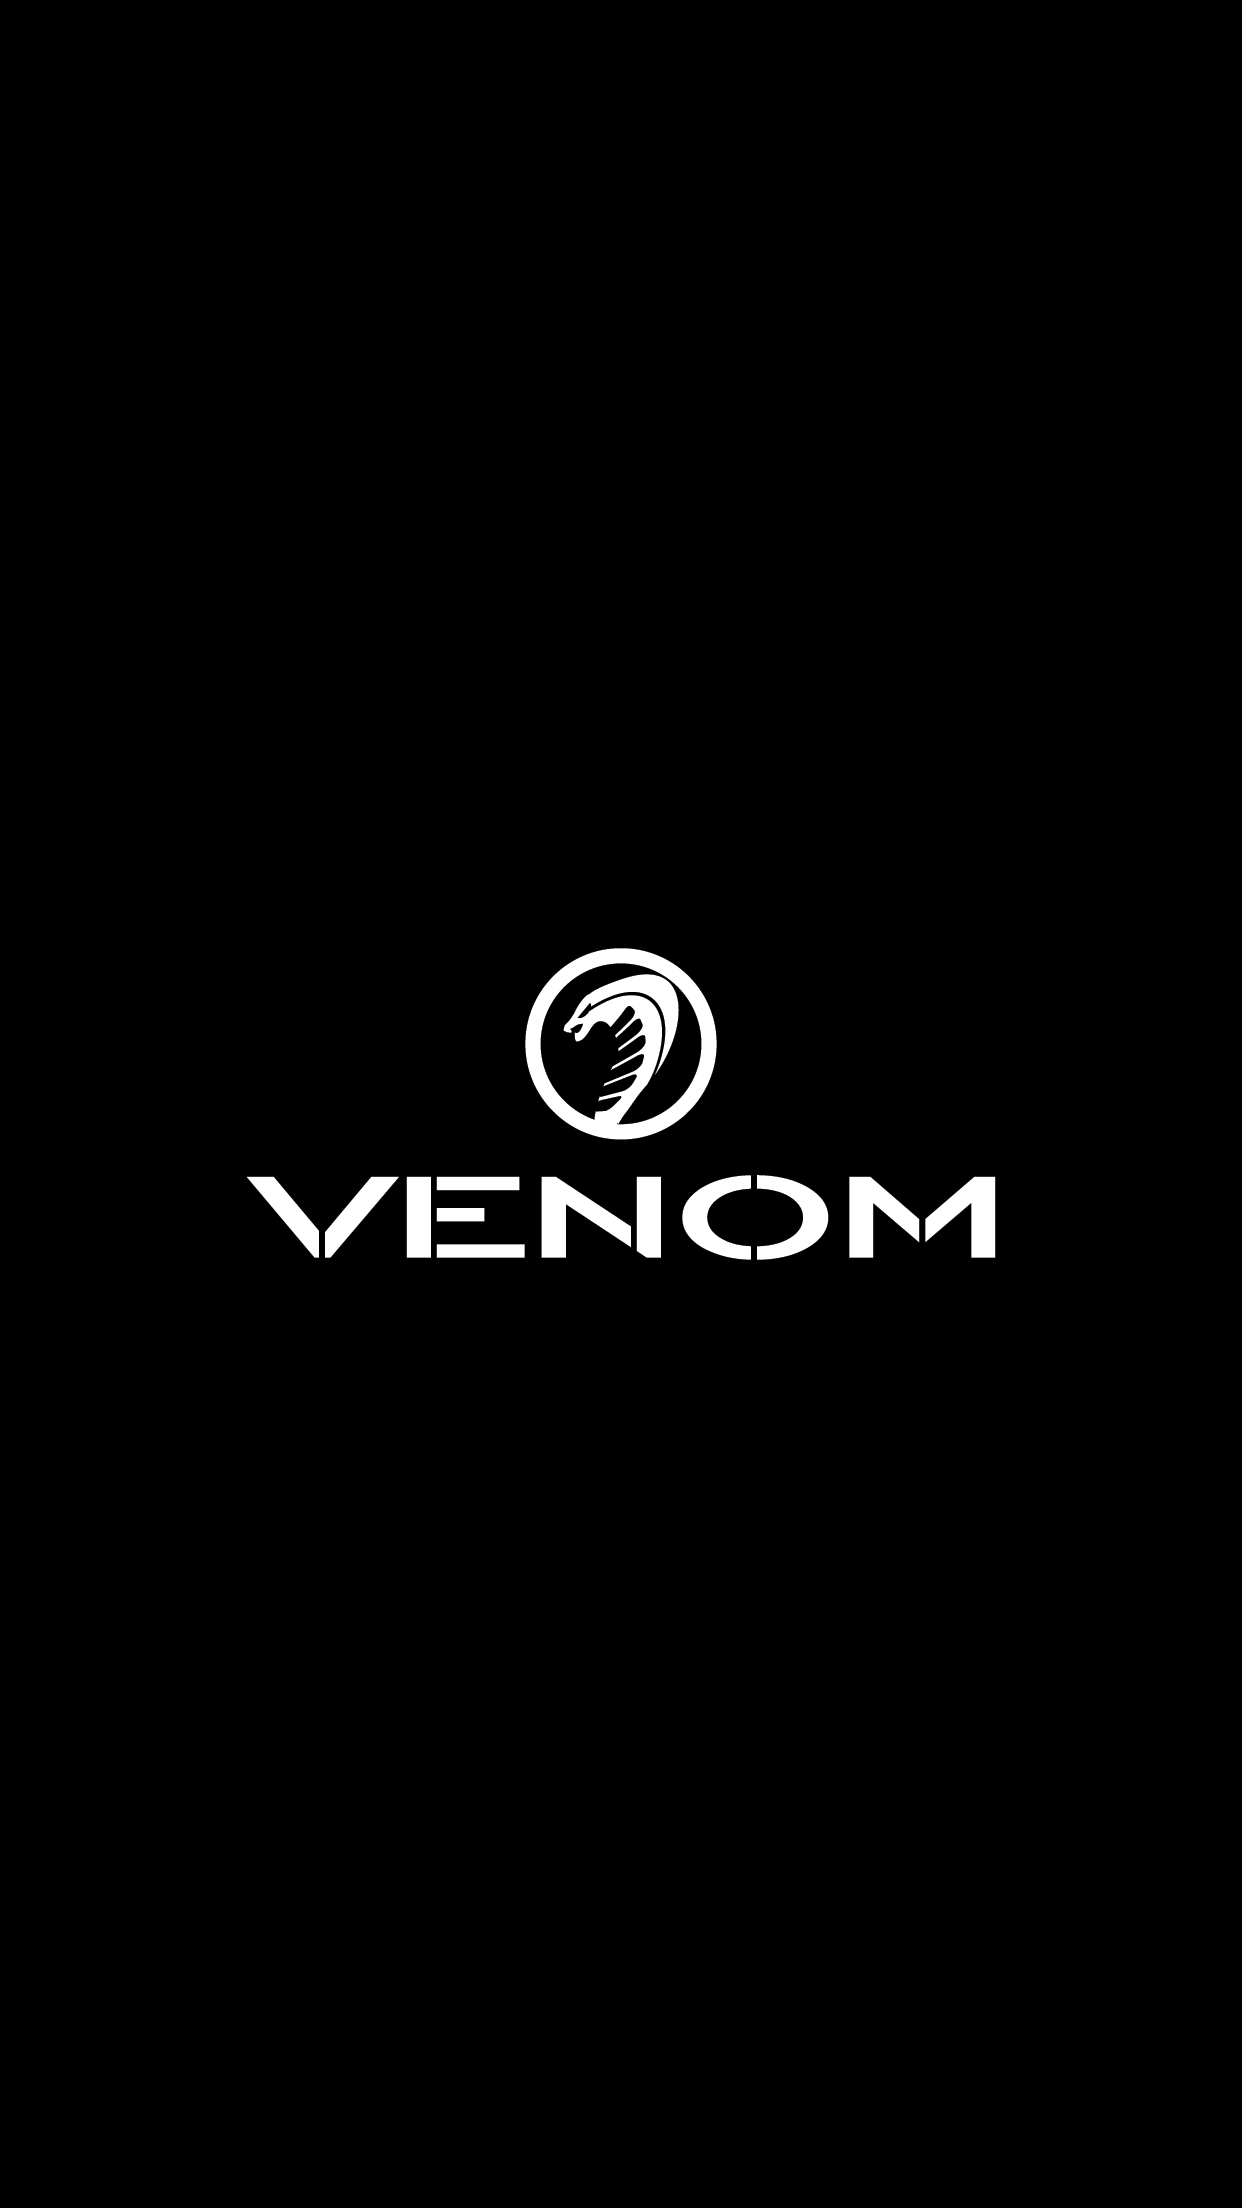 Download Venom Mobile Wallpapers Venom Computers